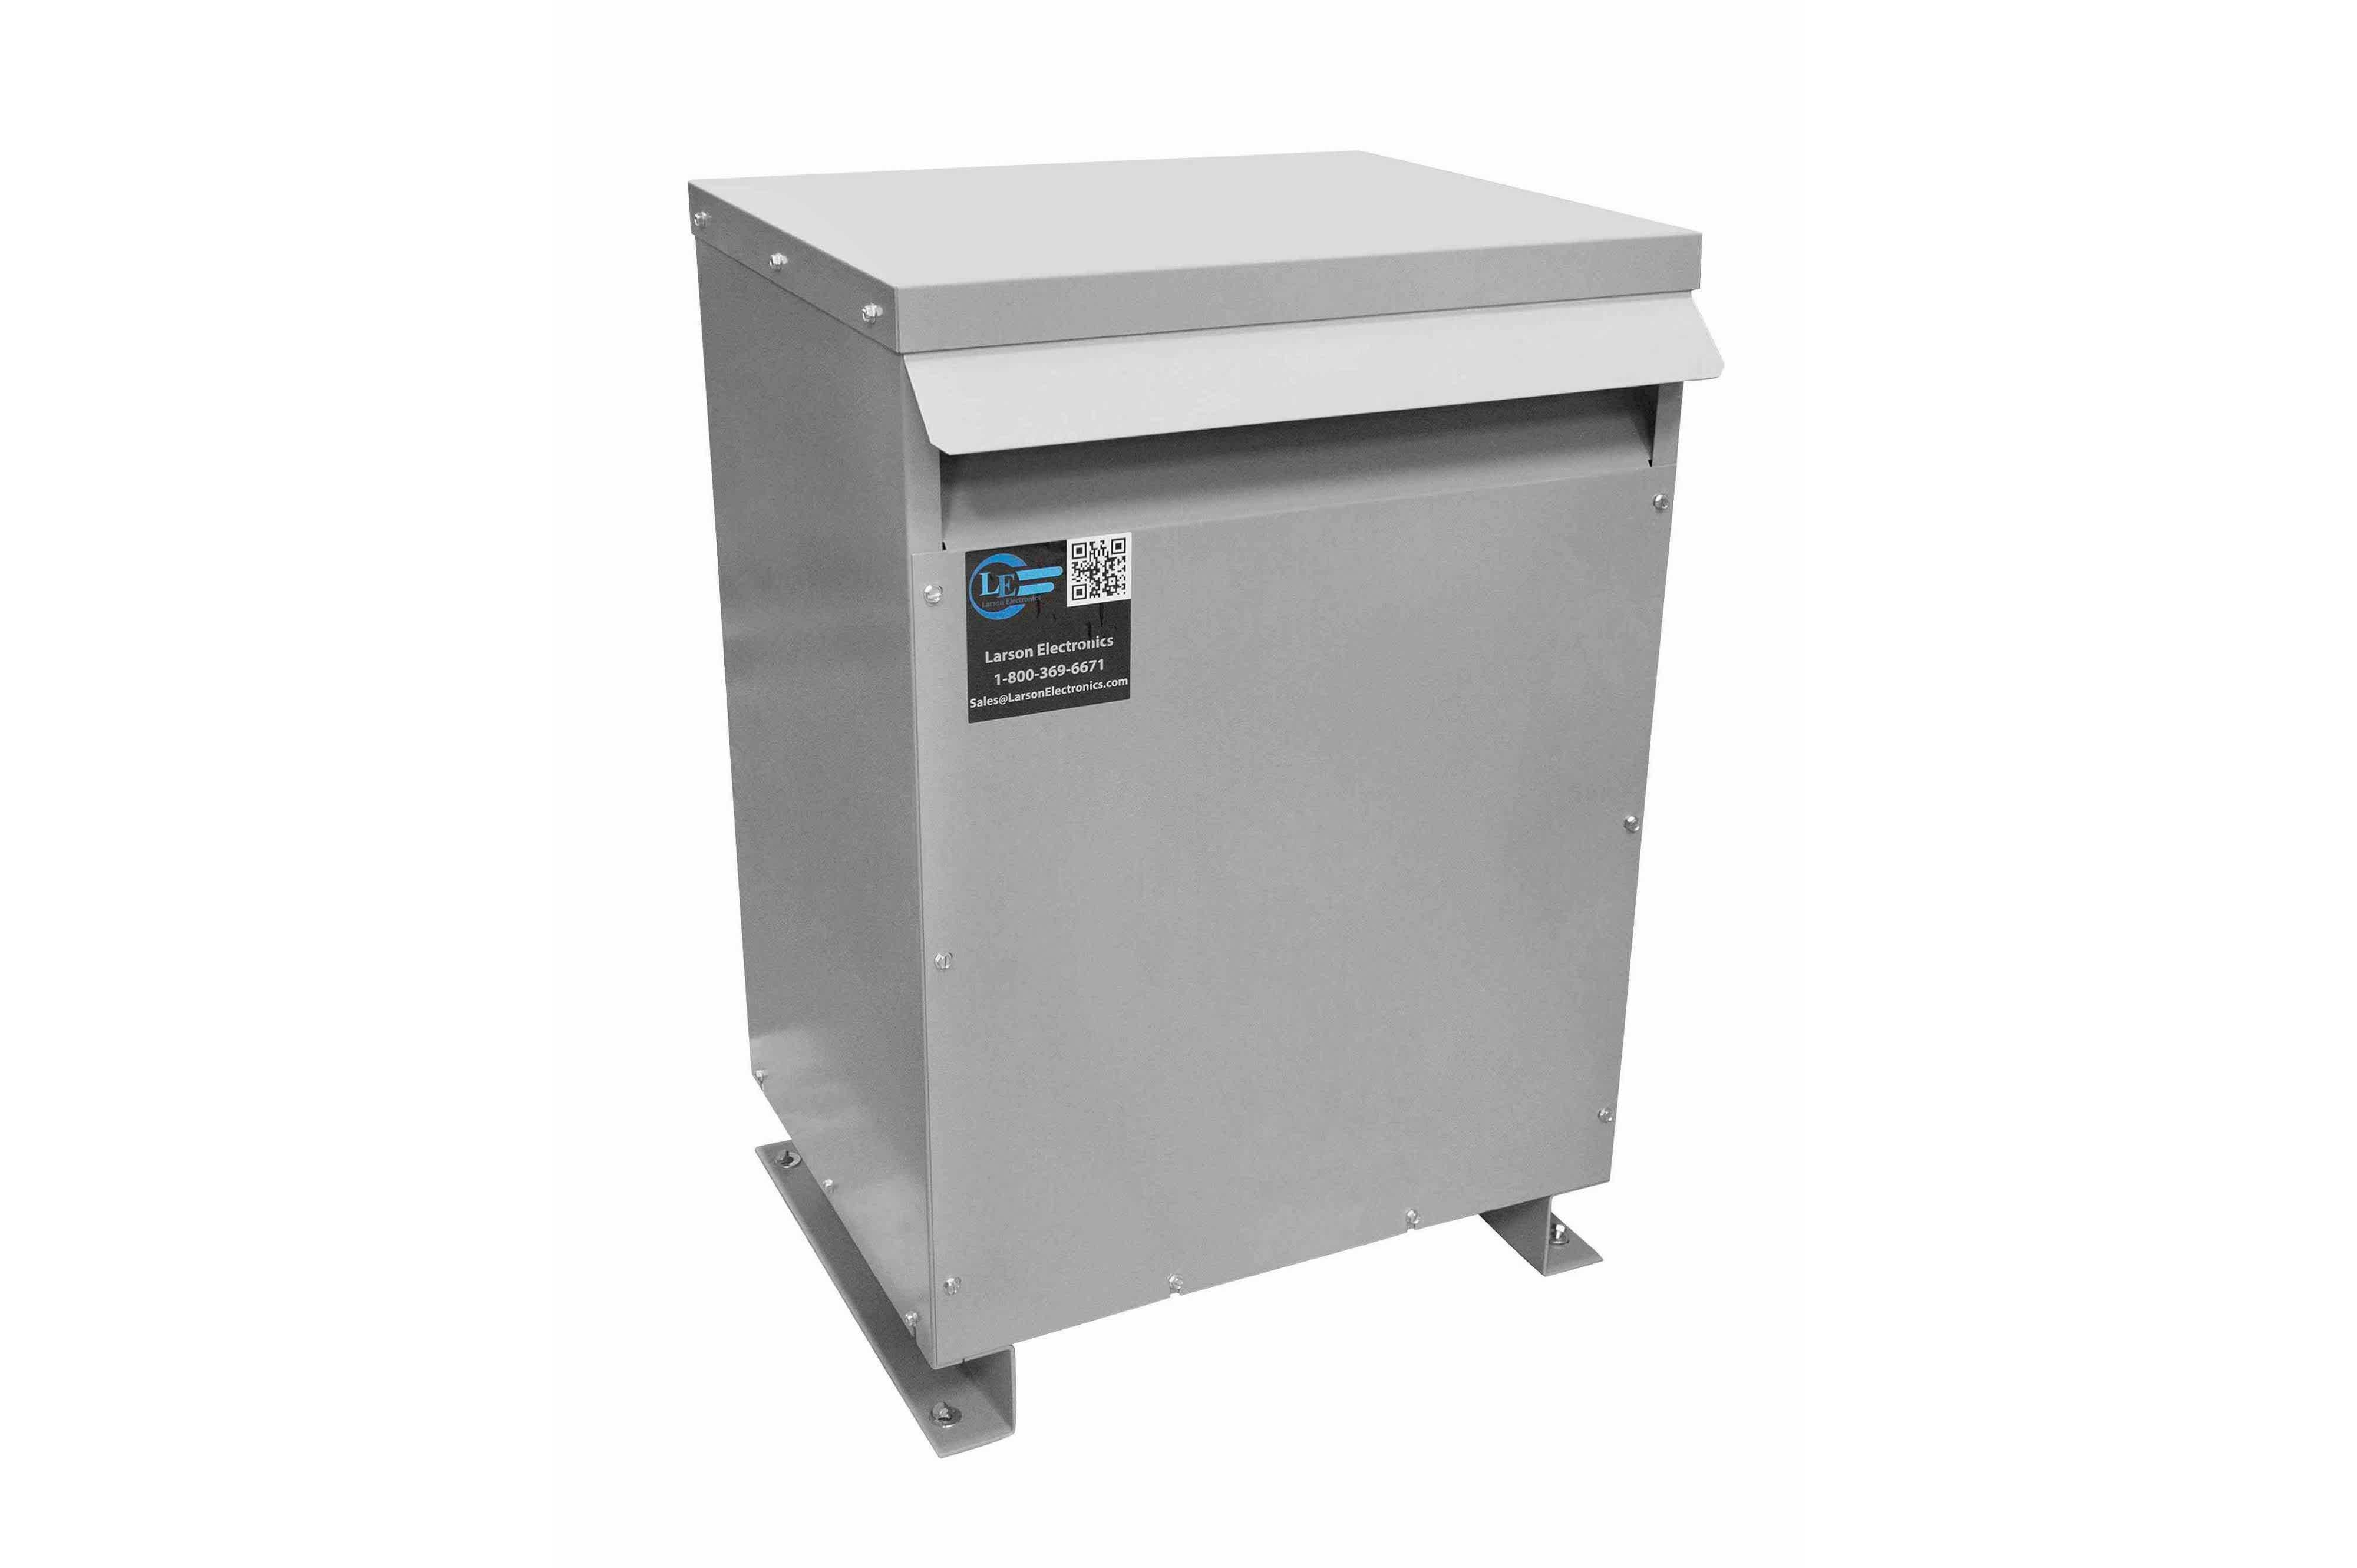 75 kVA 3PH DOE Transformer, 230V Delta Primary, 480Y/277 Wye-N Secondary, N3R, Ventilated, 60 Hz